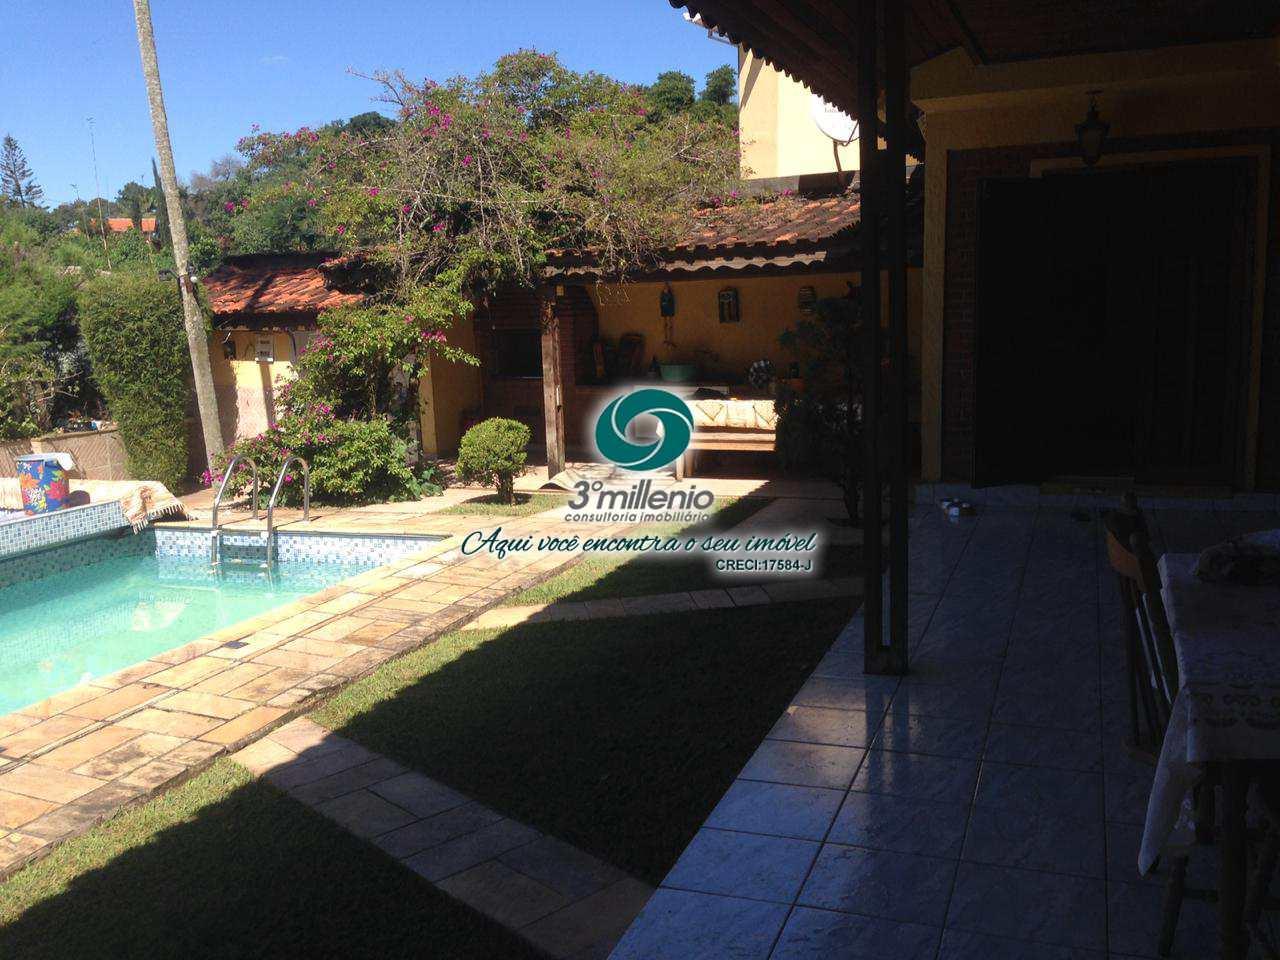 Casa com 4 dorms, Granja Viana, Carapicuíba - R$ 850 mil, Cod: 30533